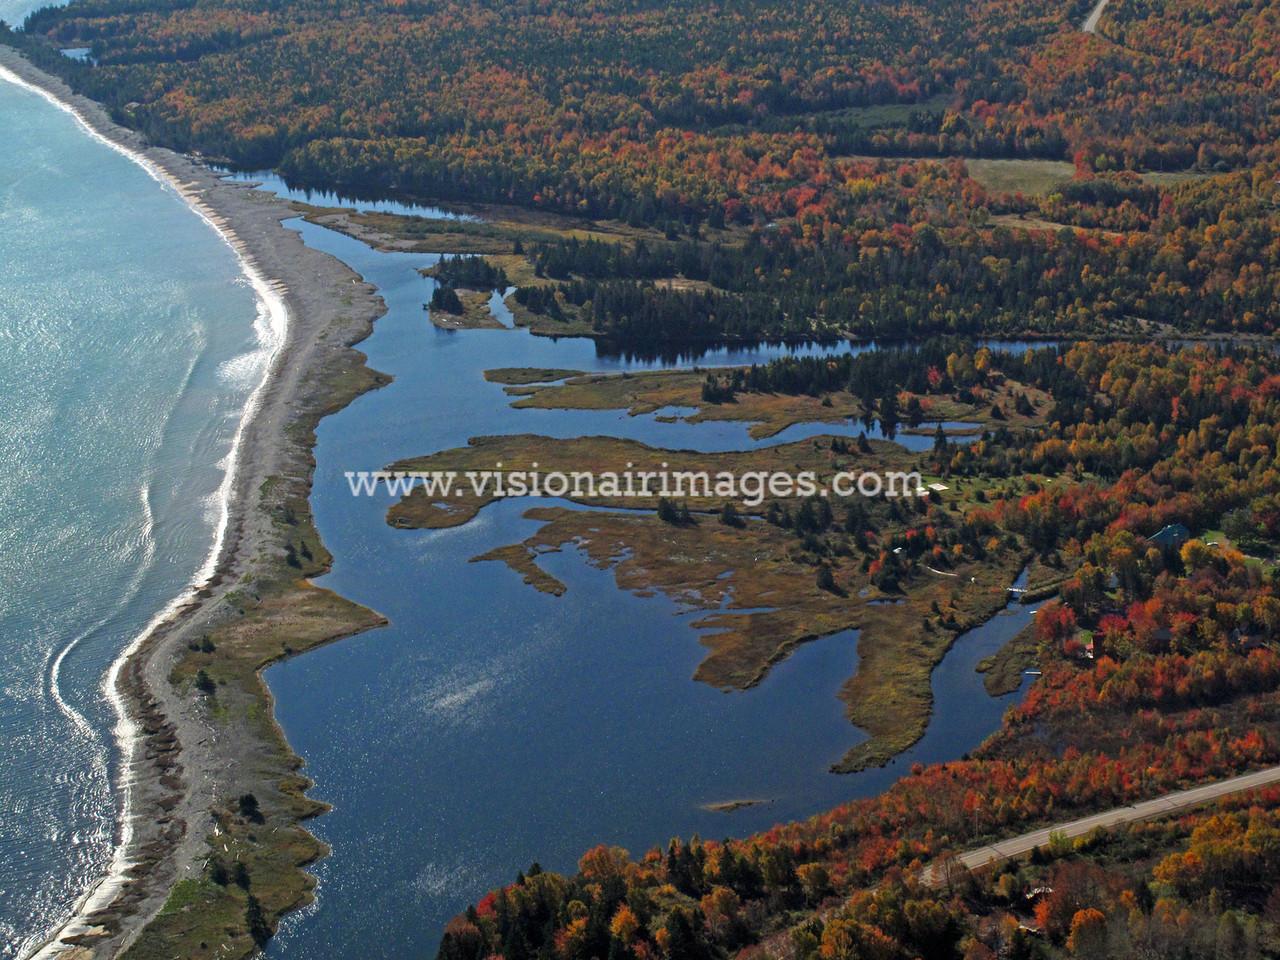 Indian Brook, Cabot Trail, 30, Sydney, Nova Scotia, Canada